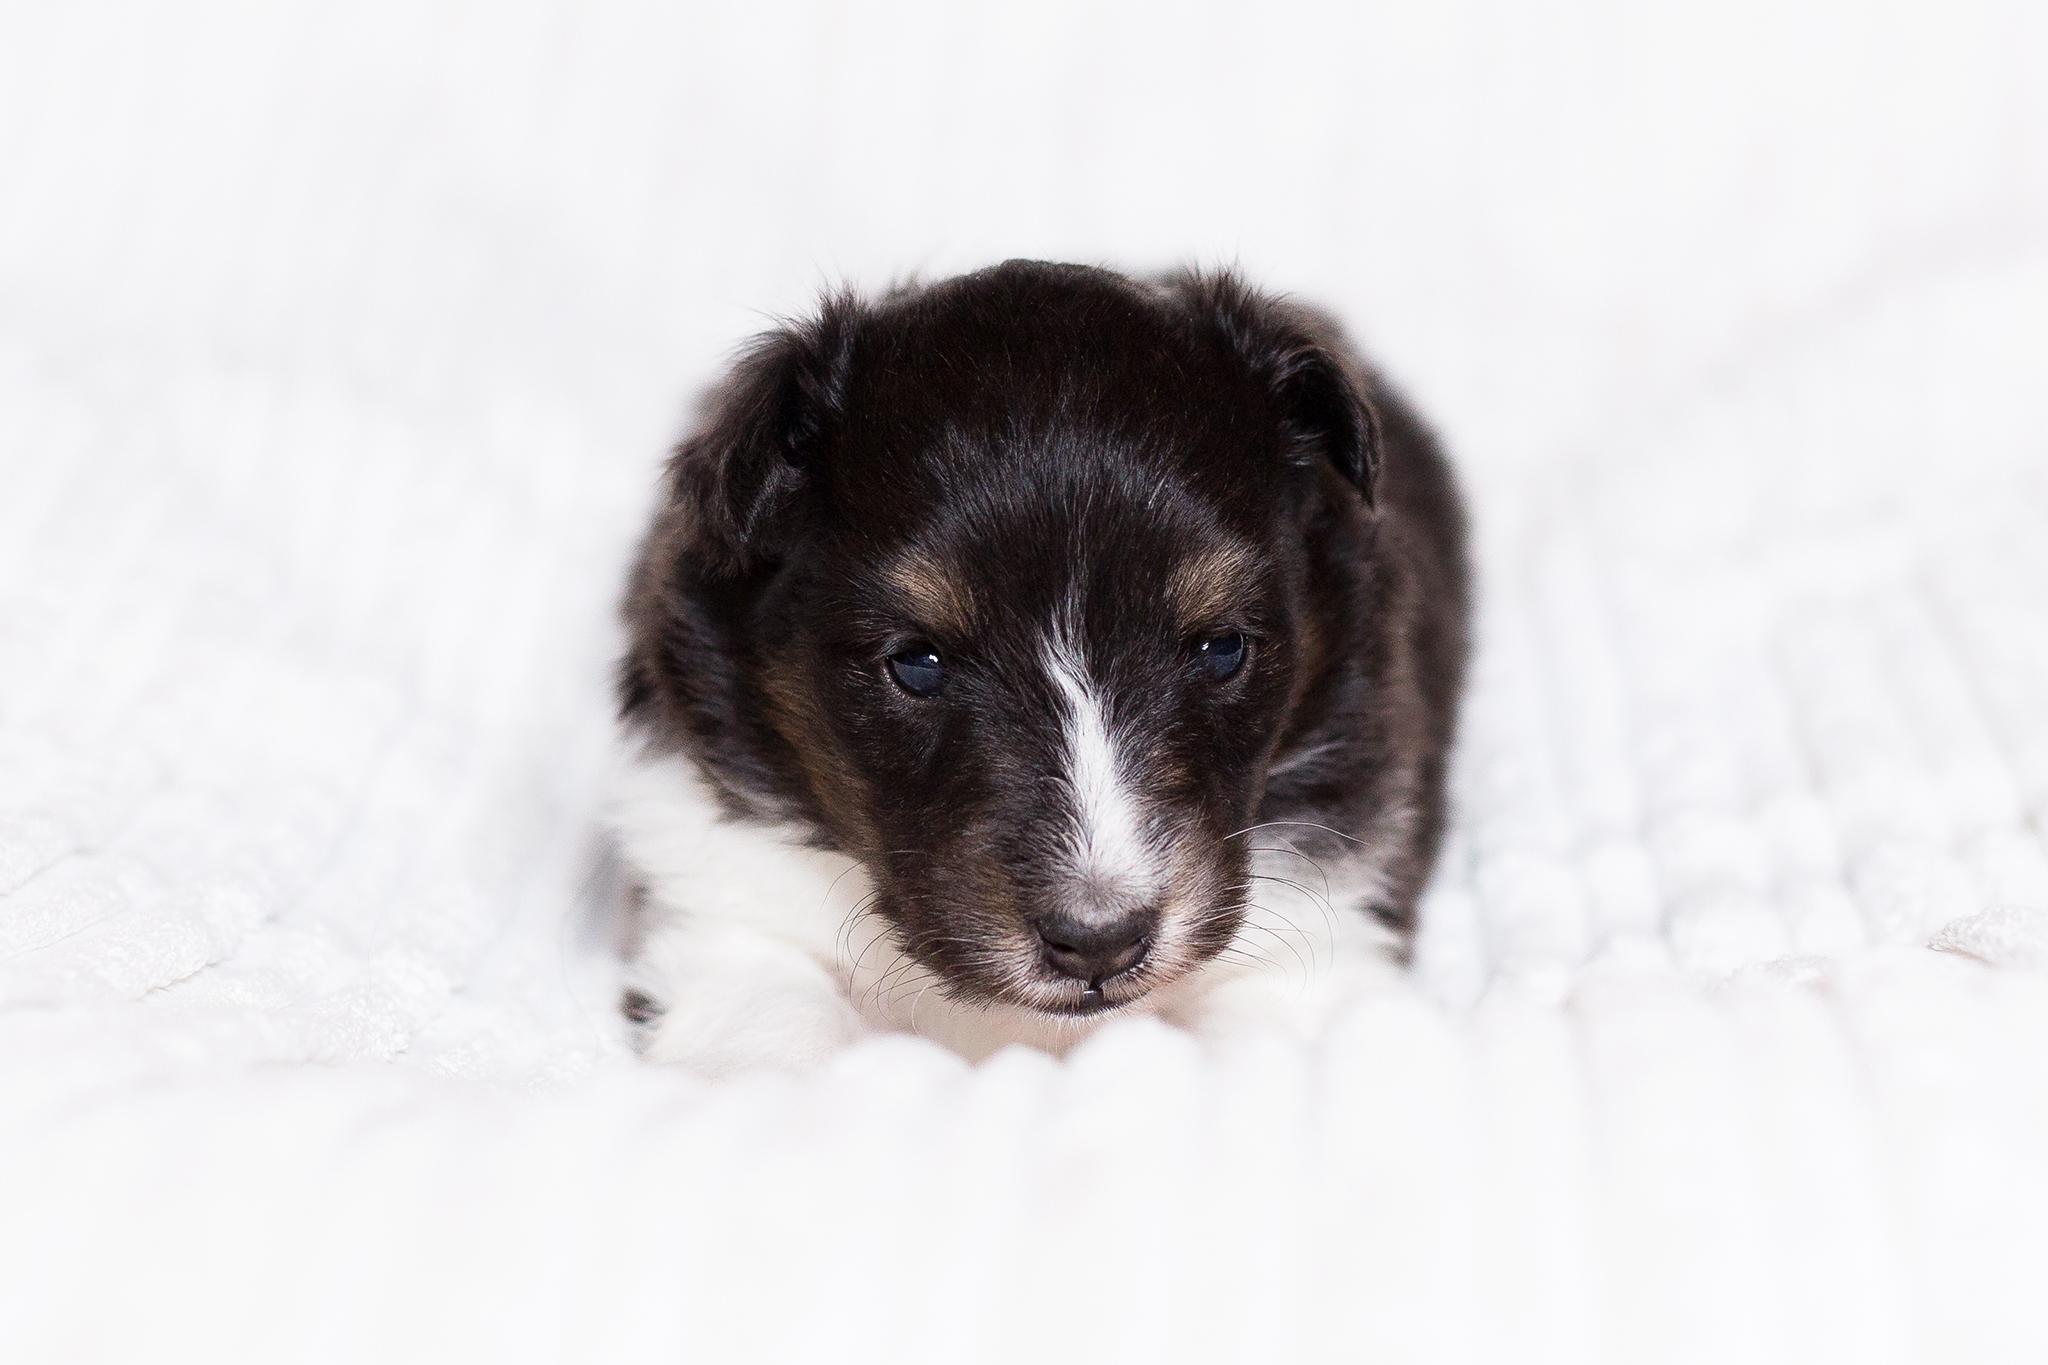 Ginny 3. Wochen alt